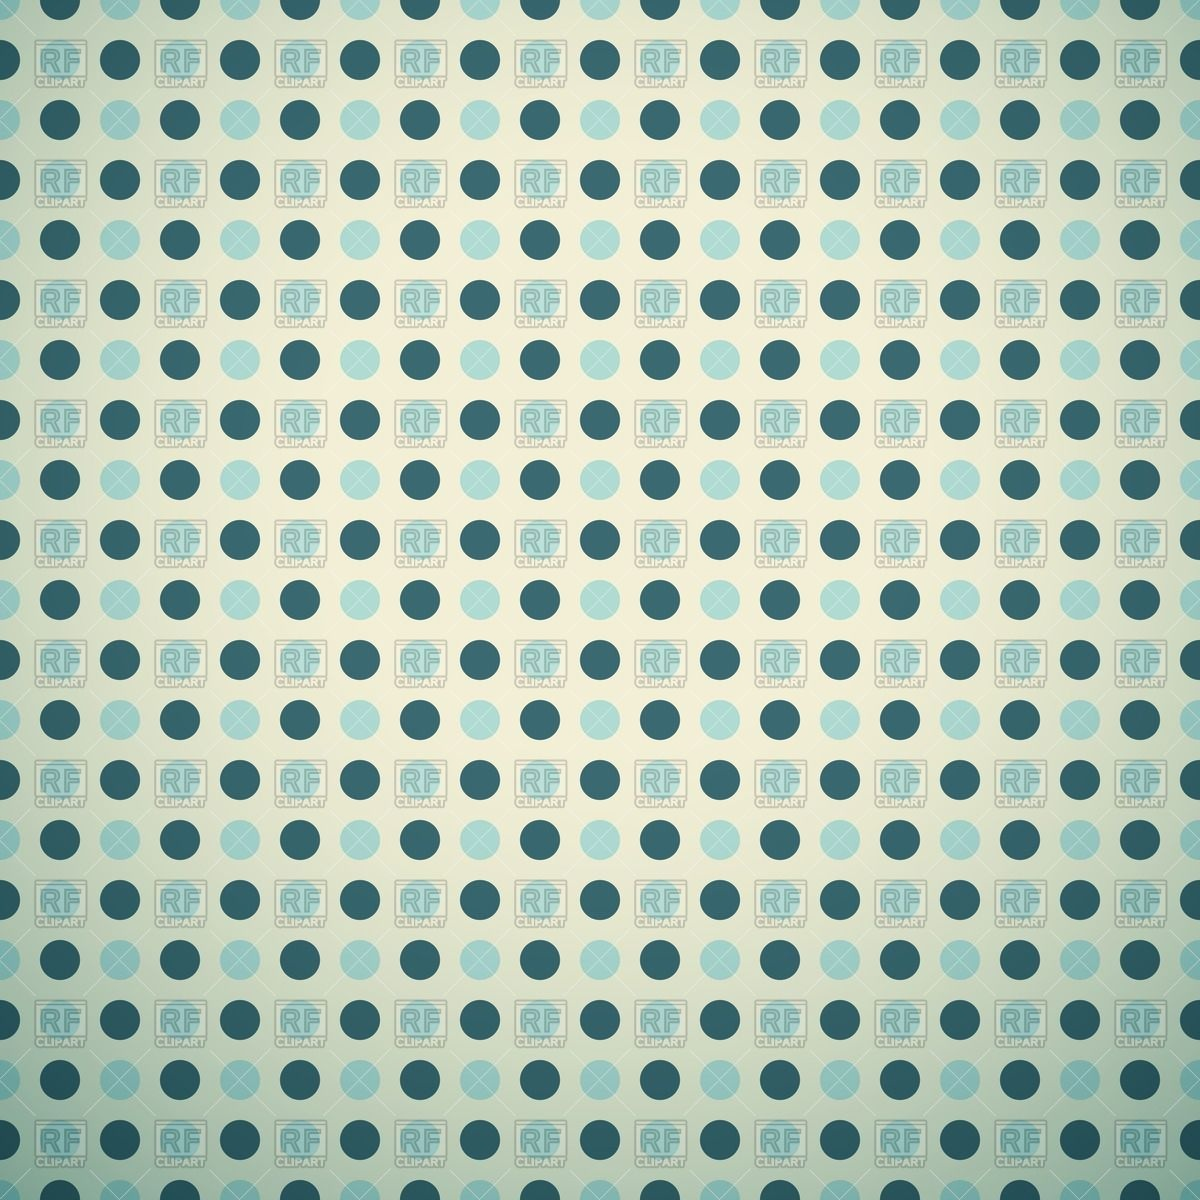 Retro blue polka dot background Stock Vector Image.